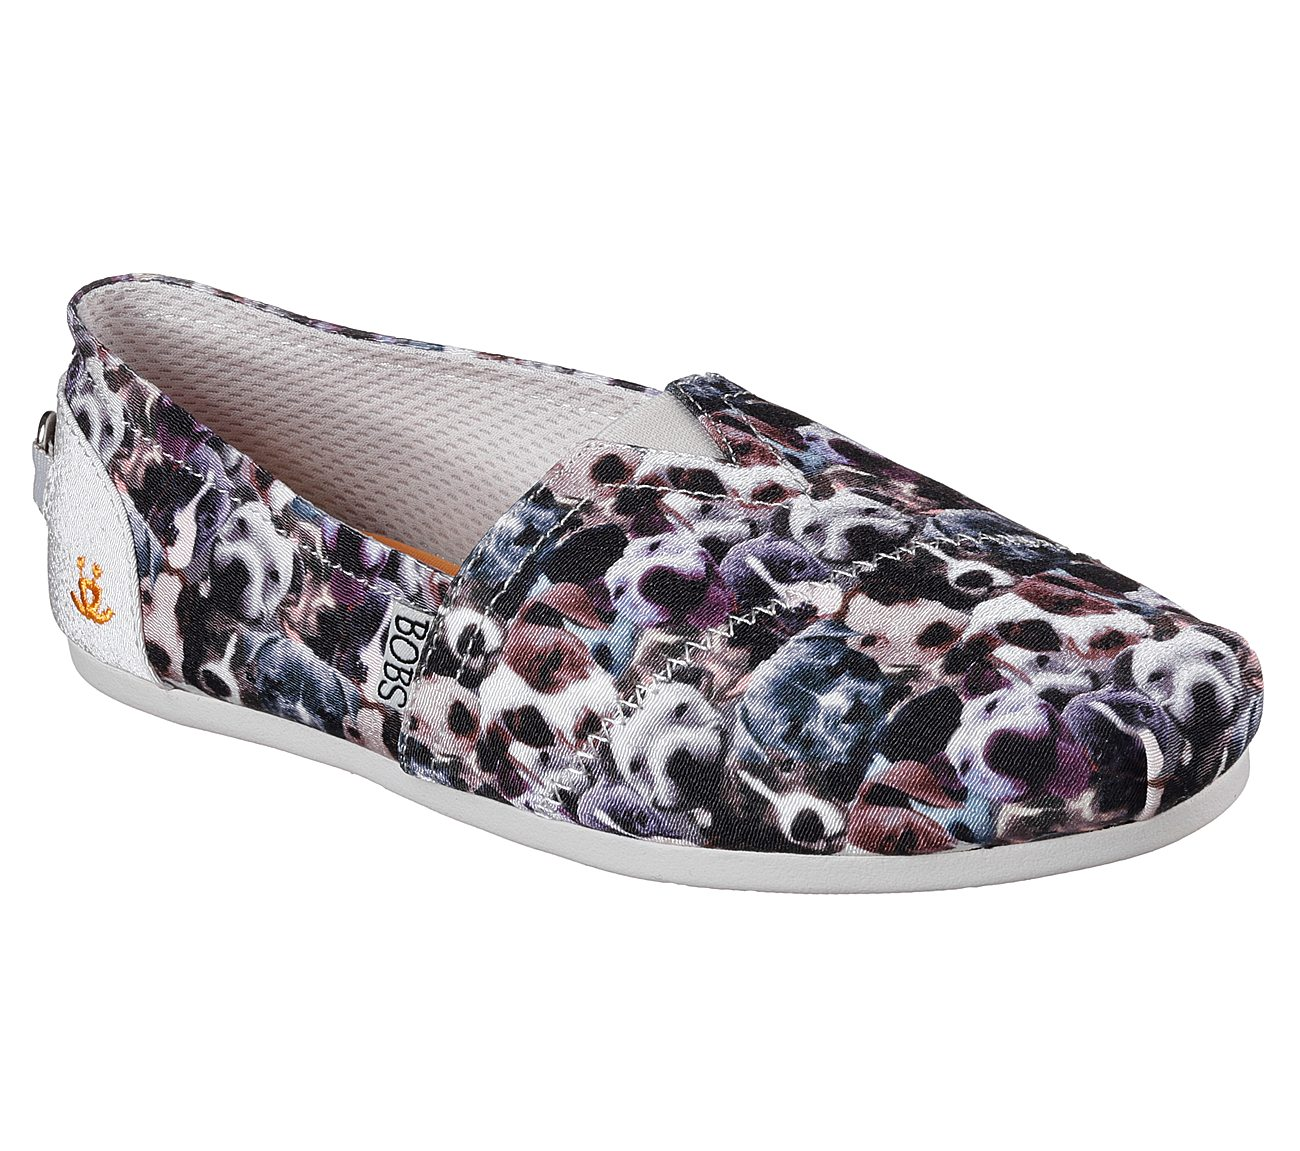 611b8255be91 Buy SKECHERS BOBS Plush - Kismet BOBS Shoes only  27.00